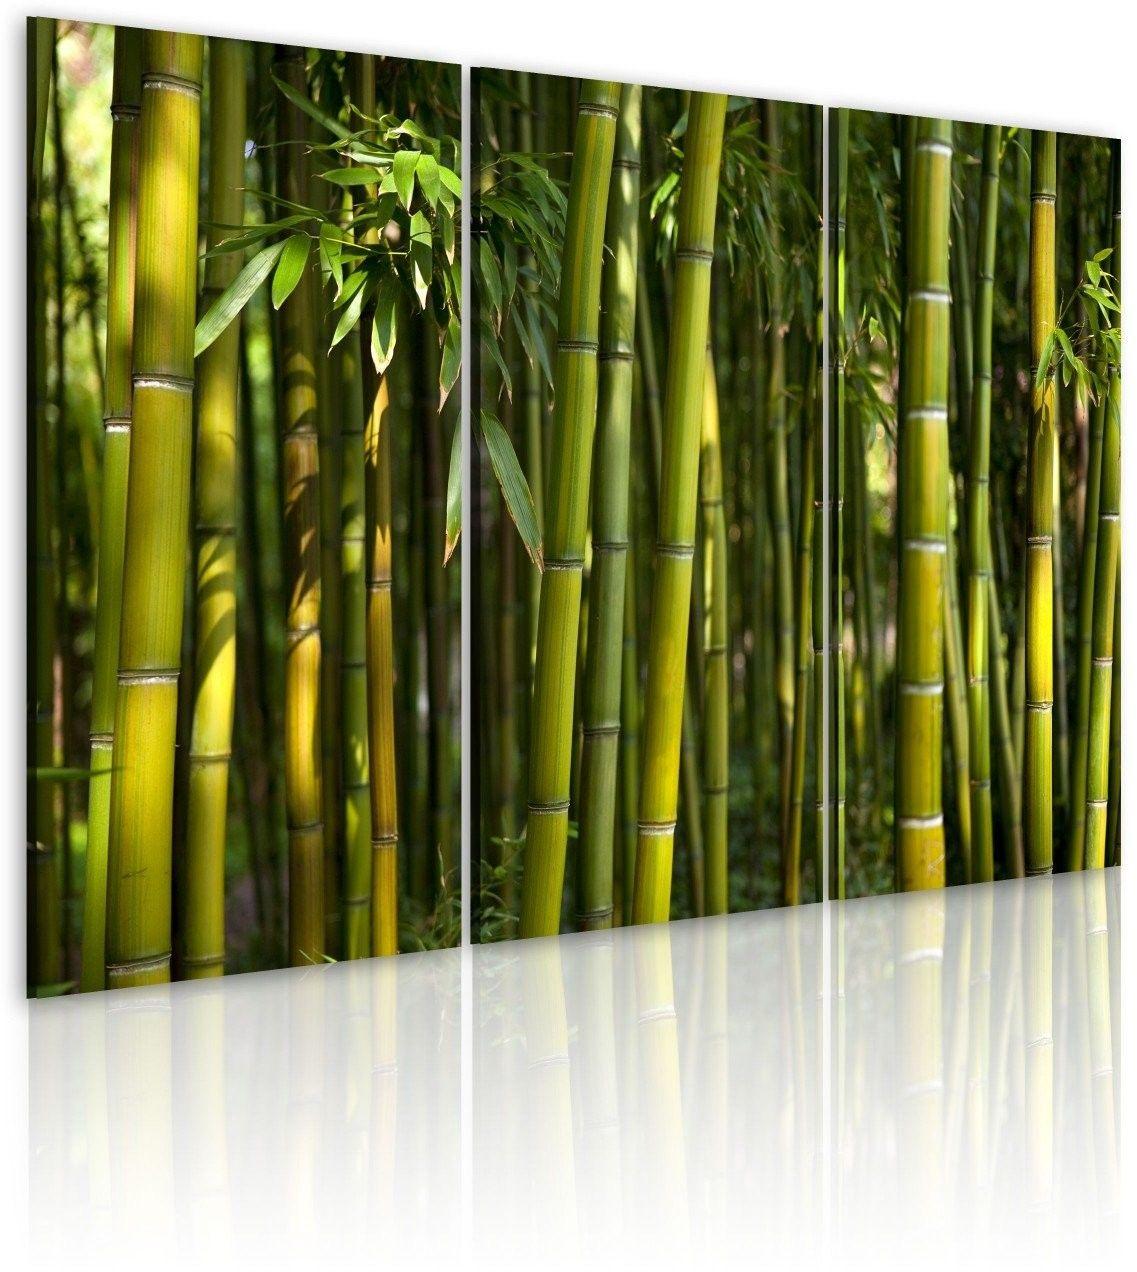 Obraz - bambus i zieleń